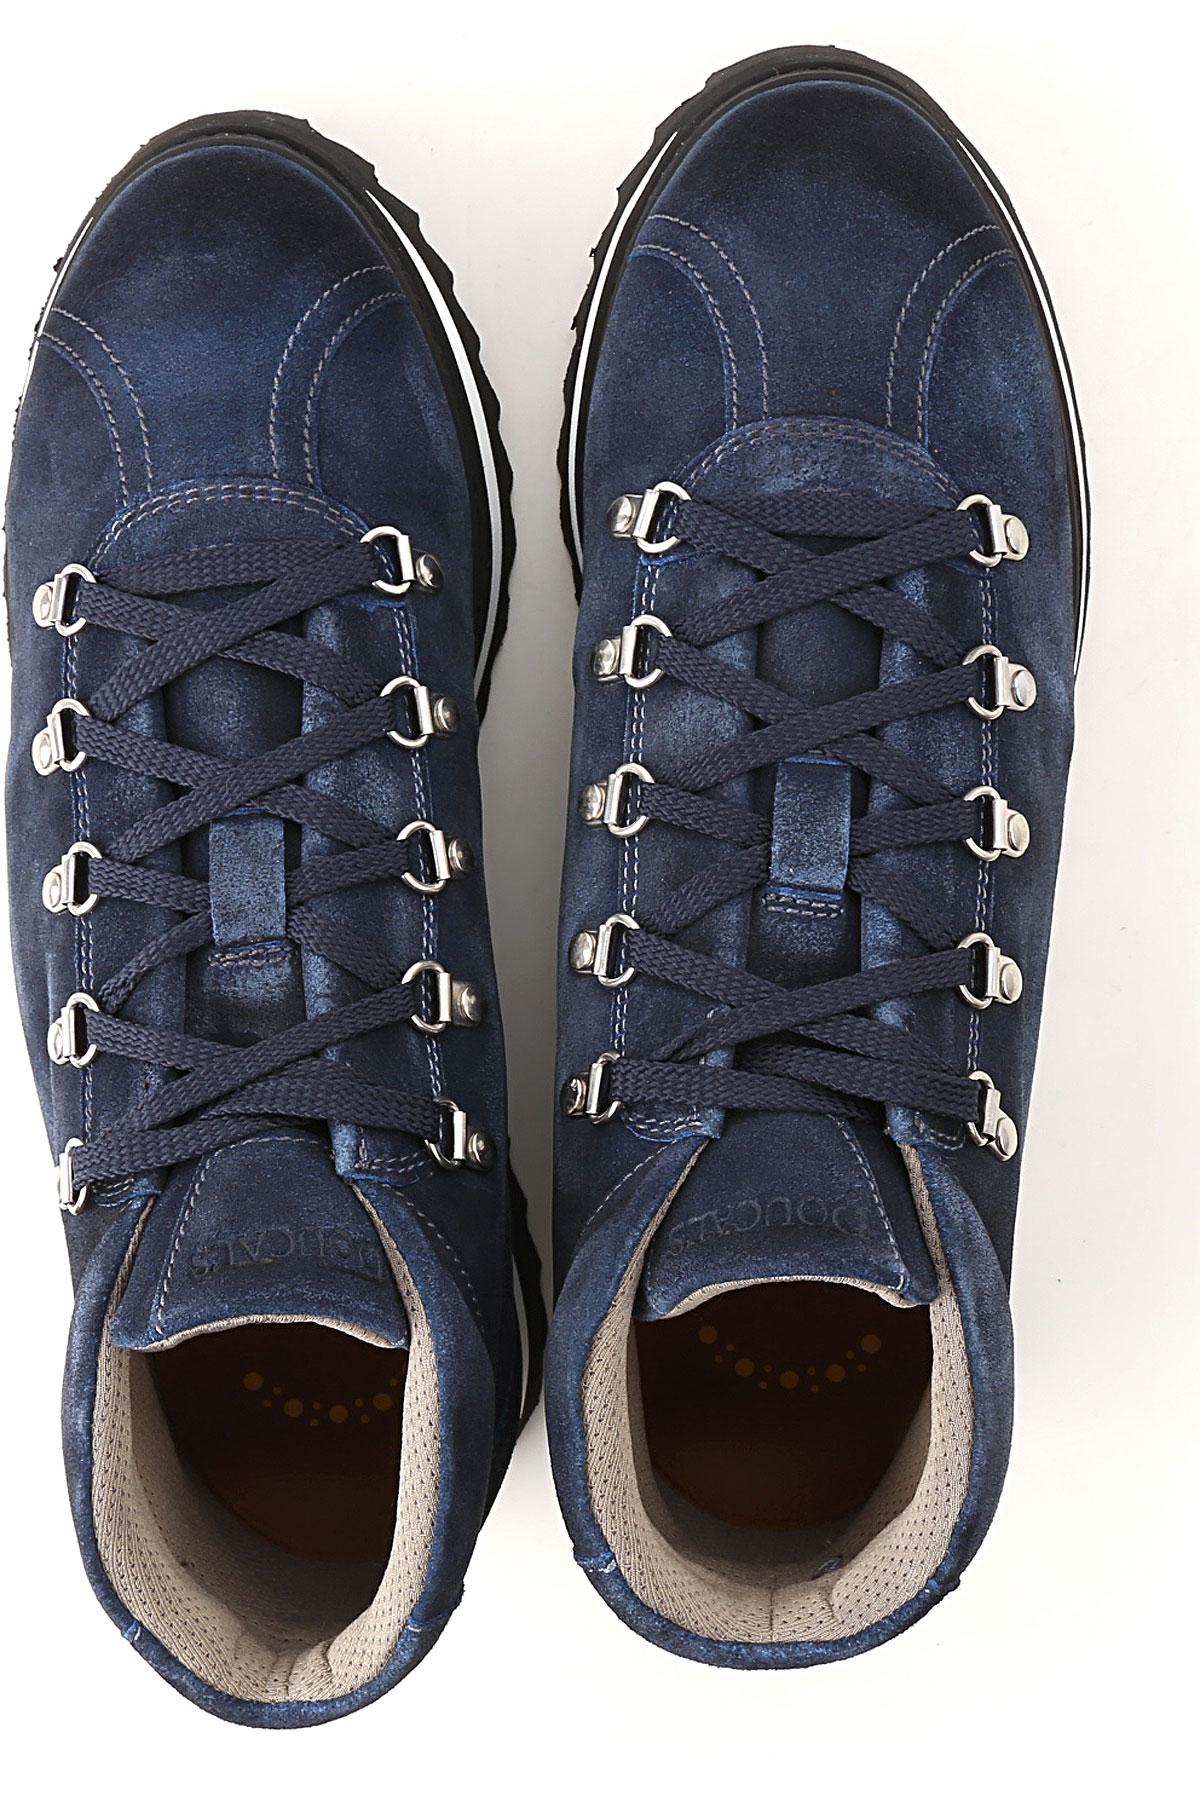 Azul 2018 19 Doucals Zapatos Medianoche invierno Hombres Para Otoño nbsp; qqX0PFw